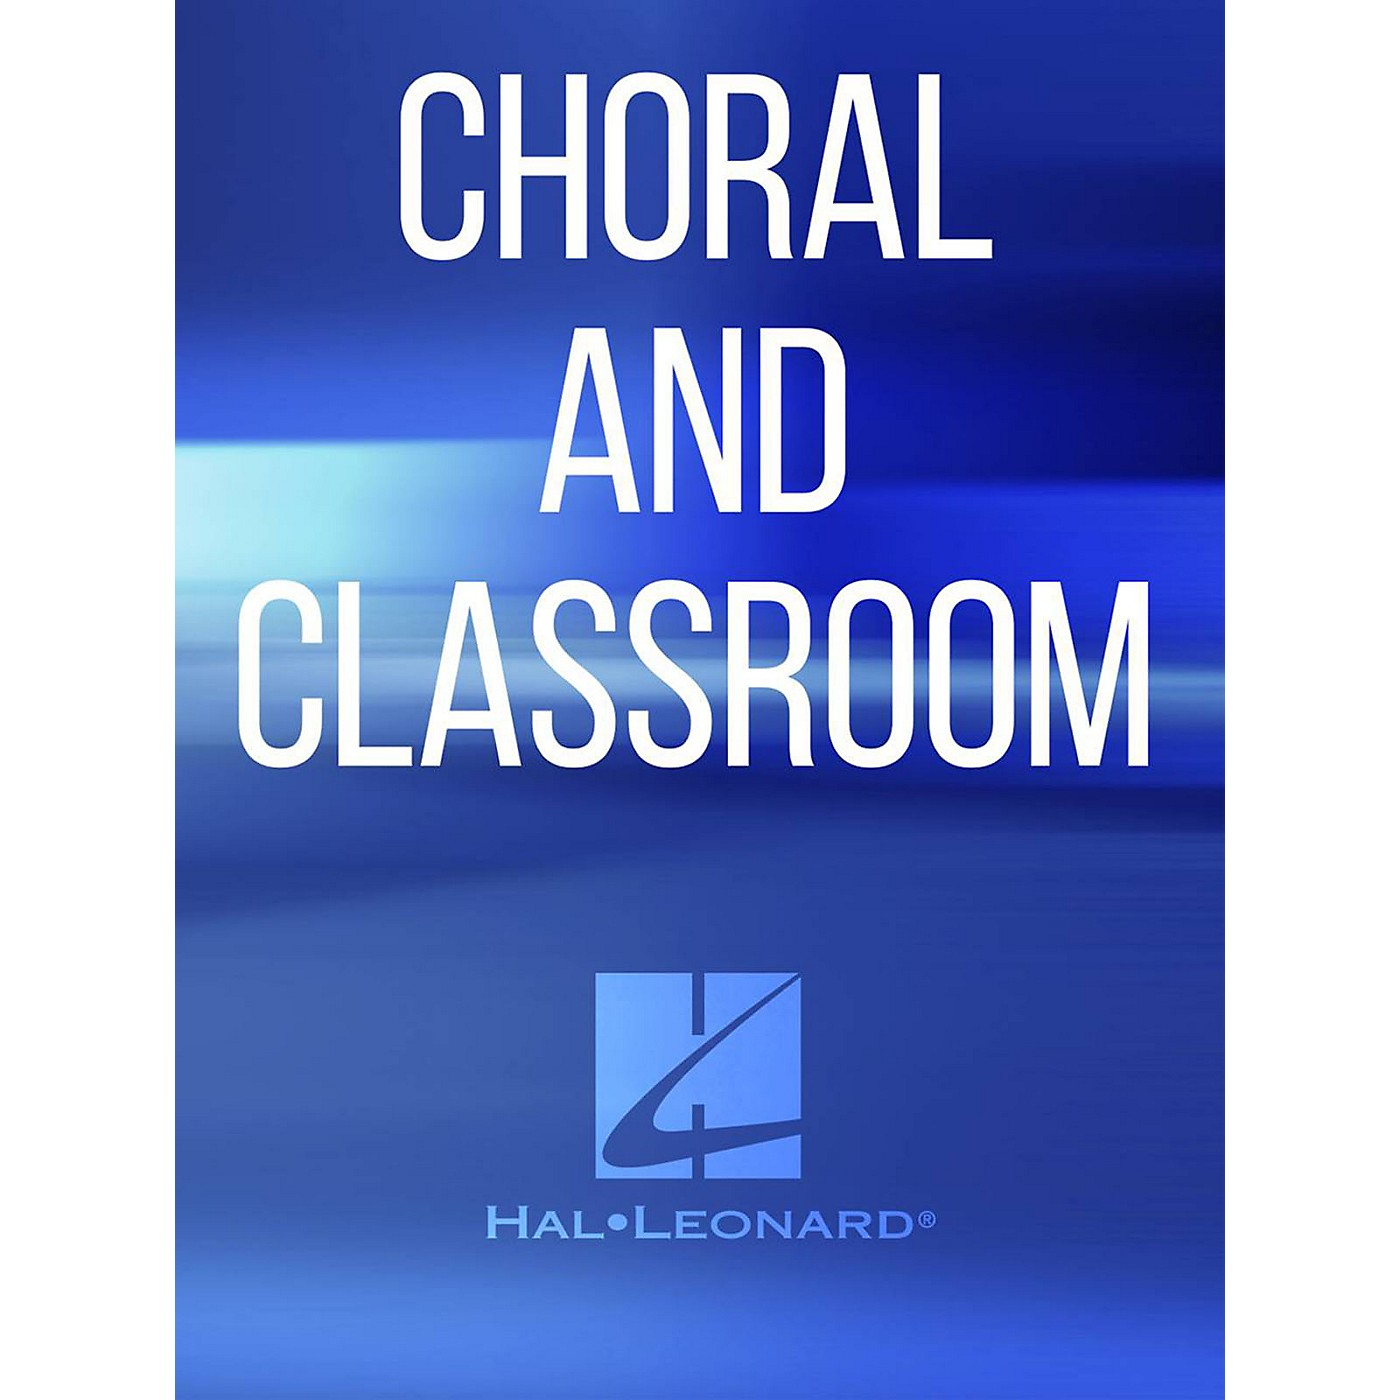 Hal Leonard Hallelujah TTBB Div A Cappella Arranged by Mark Brymer thumbnail